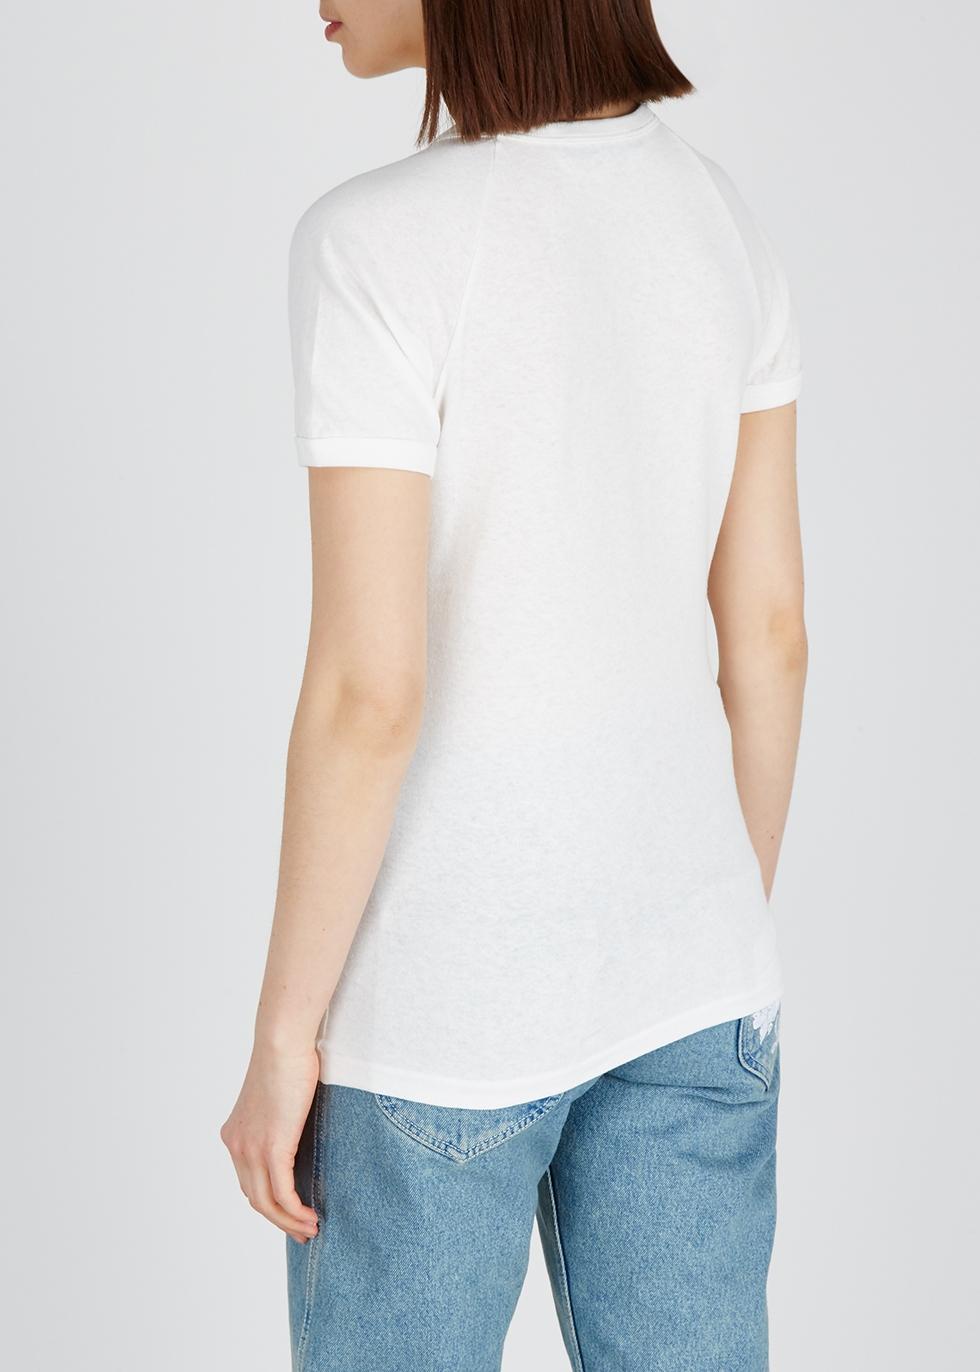 White printed cotton T-shirt - Gucci